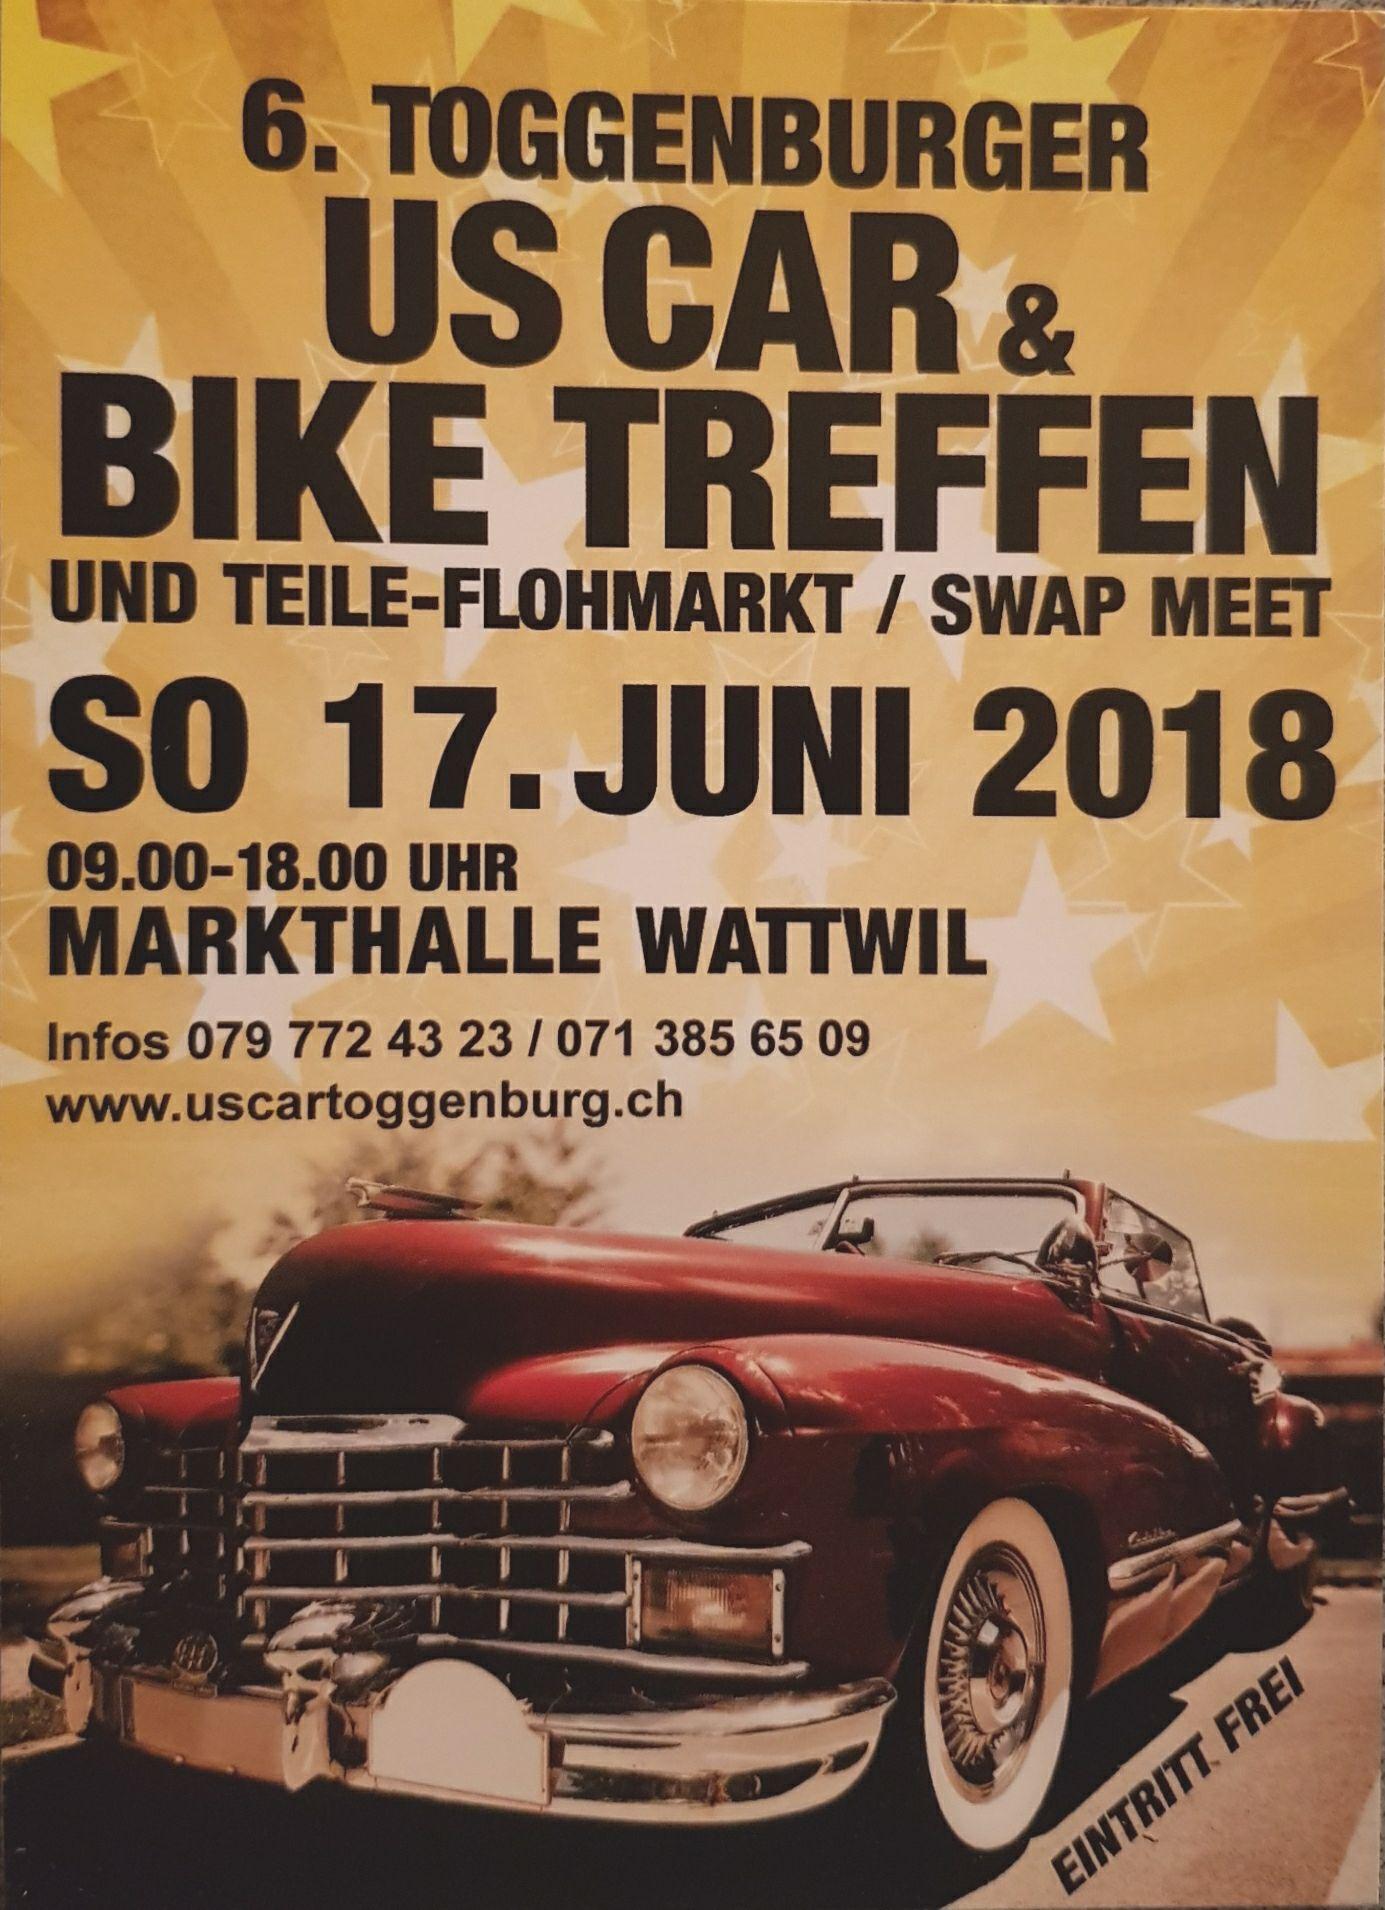 6_toggenburger_us_car_bike_treffen_markthalle_wattwi_tg_thurgau